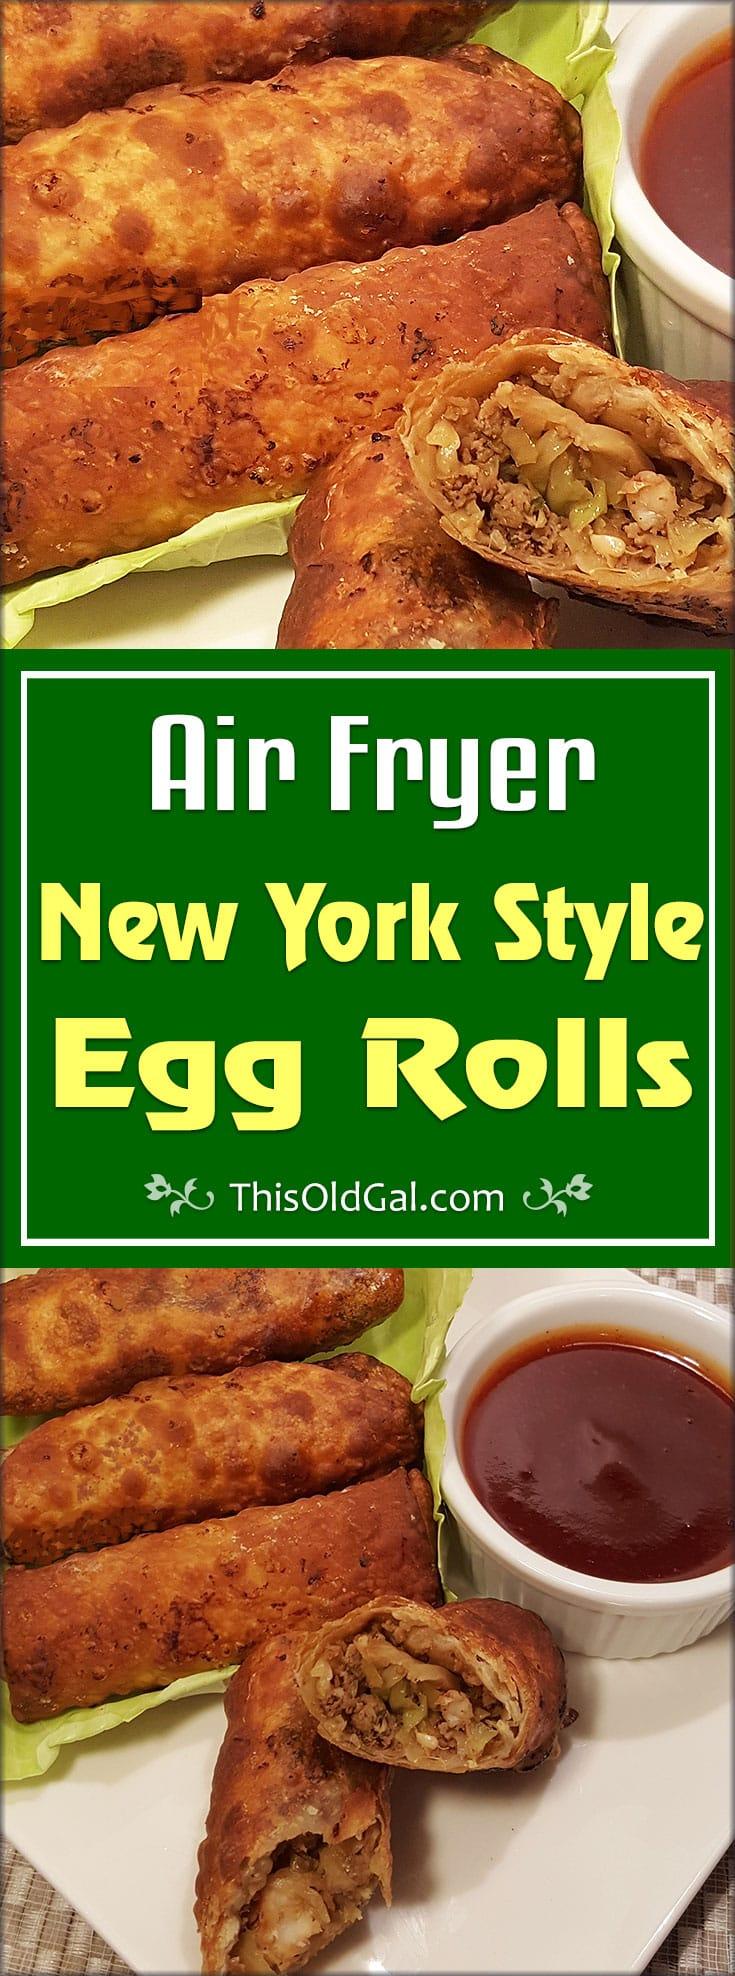 Air Fryer New York Style Egg Rolls (Shrimp & Pork)